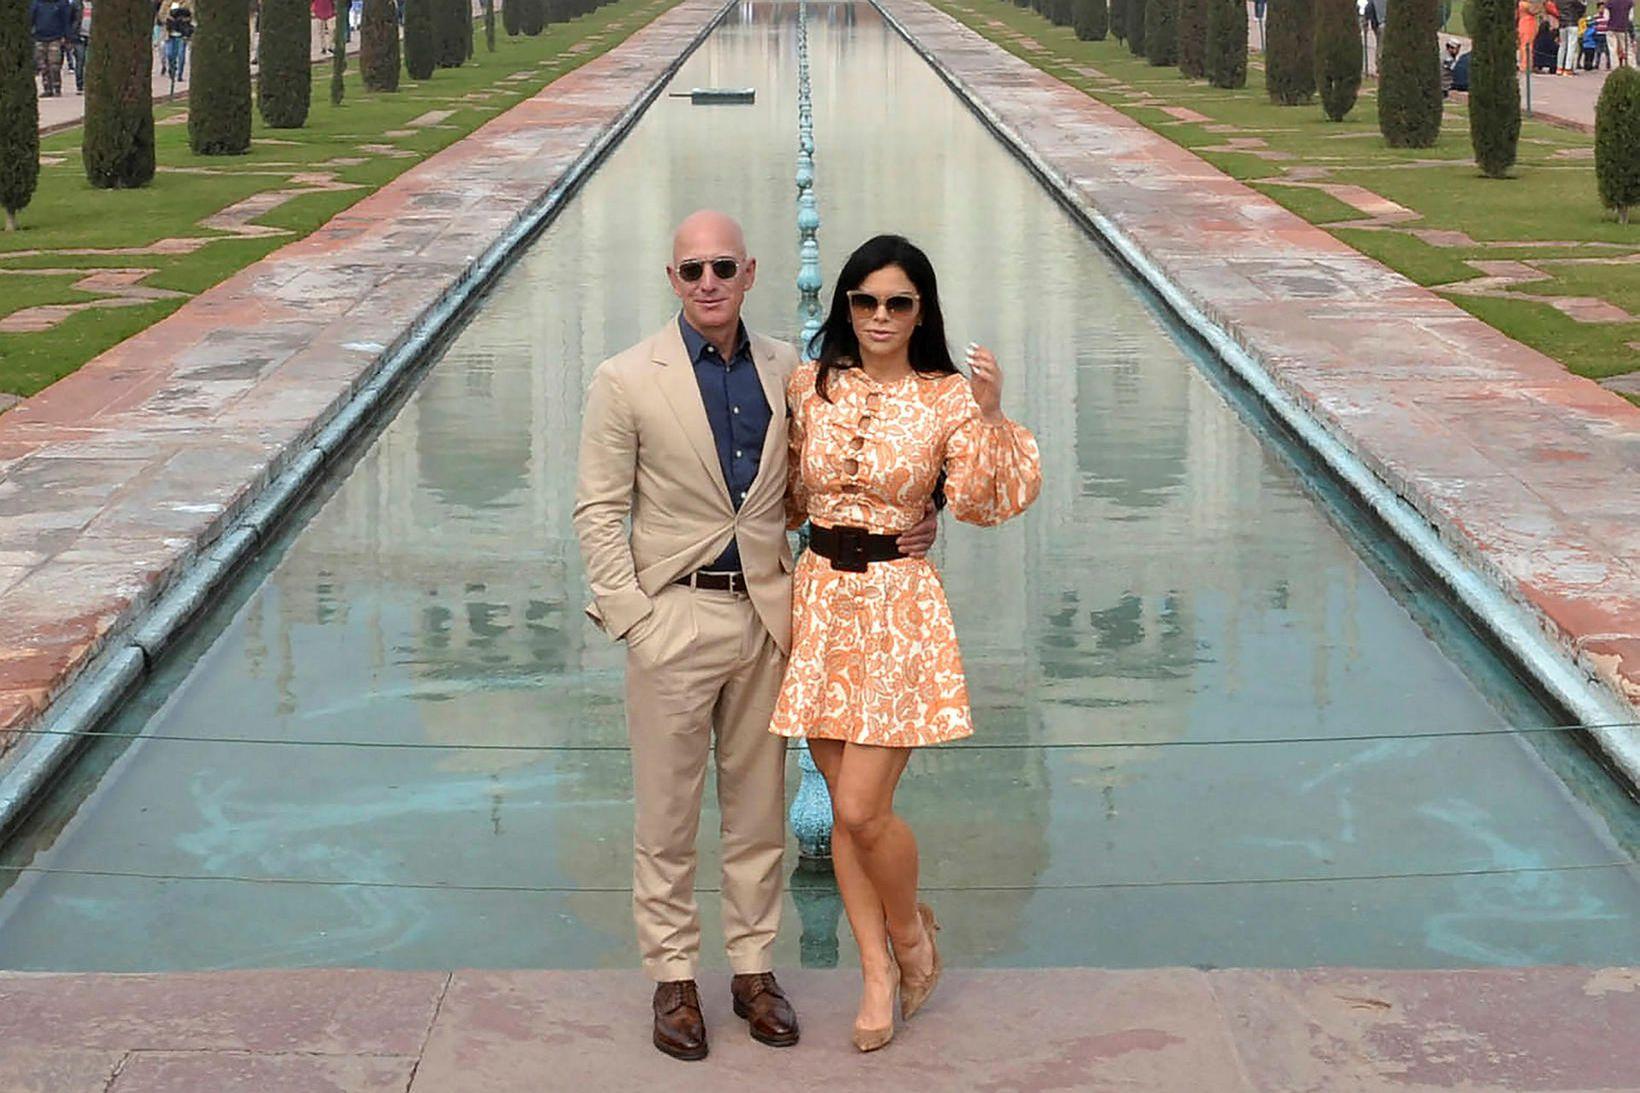 Forstjóri Amazon, Jeff Bezos ásamt unnustu sinni, Lauren Sanchez, við …